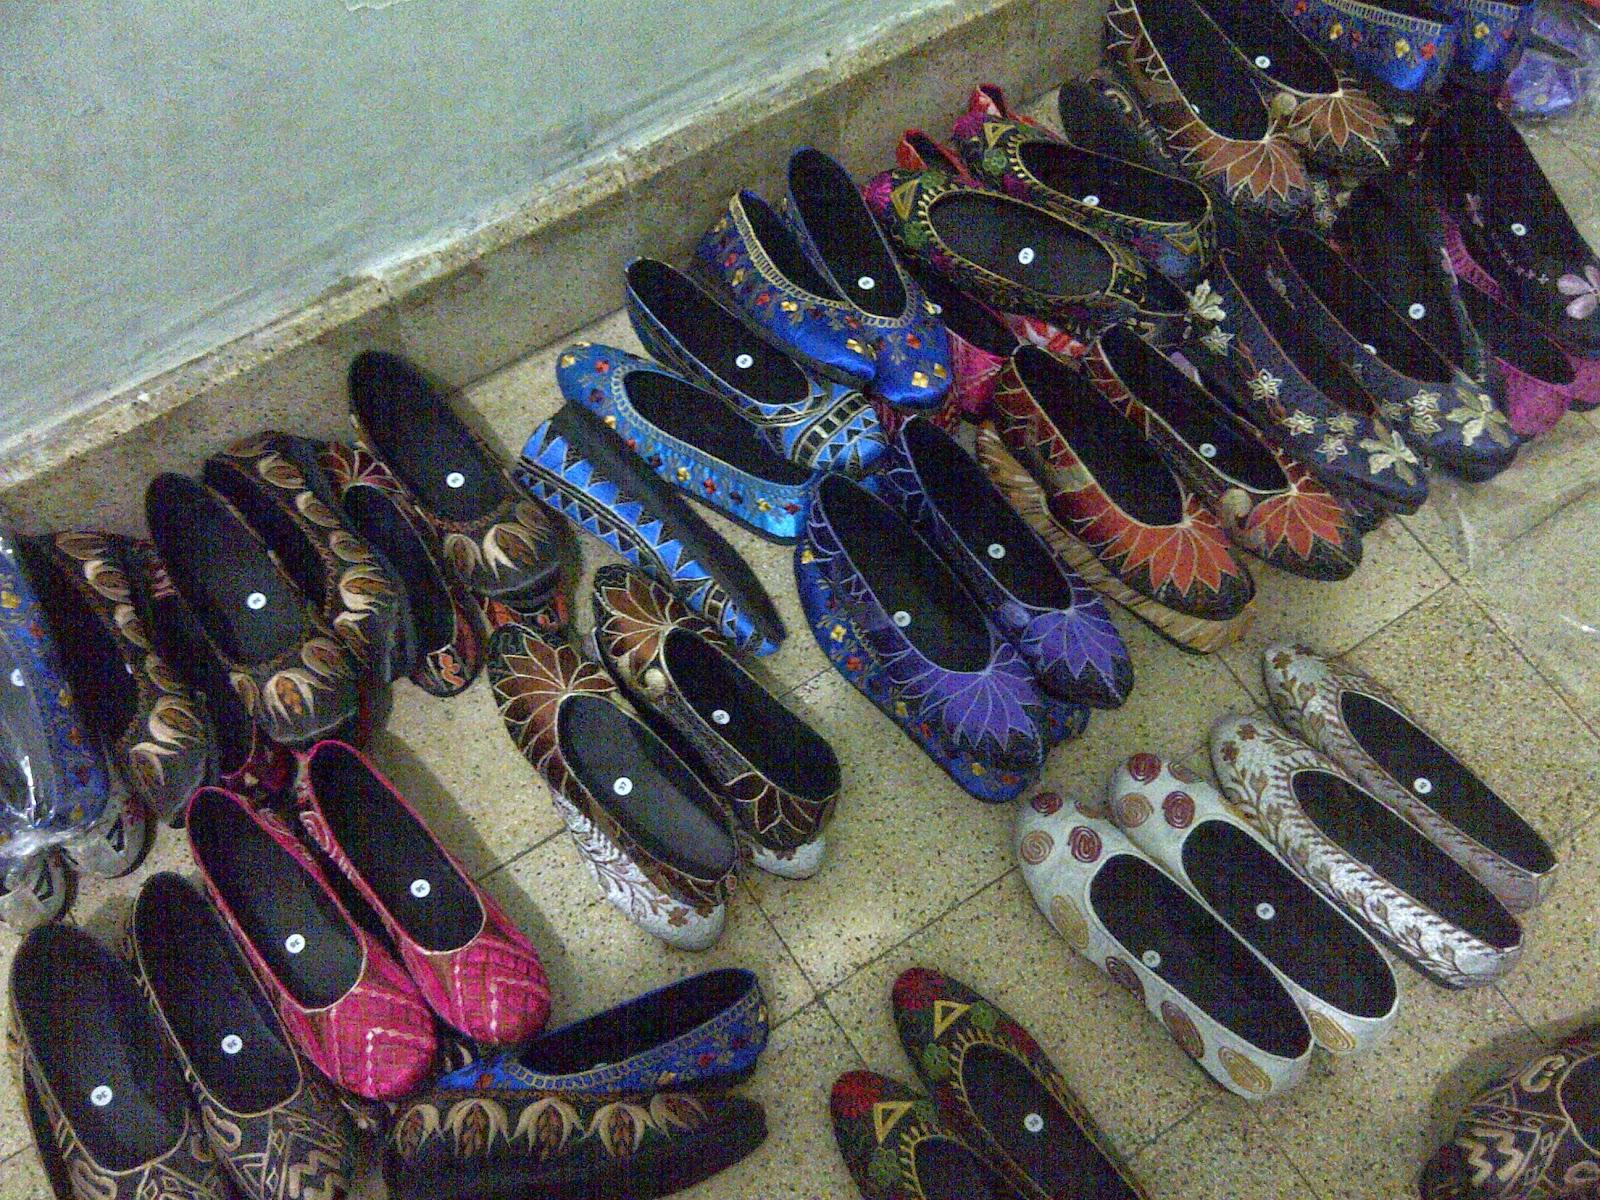 Sepatu Cantik Online, Sepatu Cantik 2015, Sepatu Keren, www.distributorsepatumurah.com